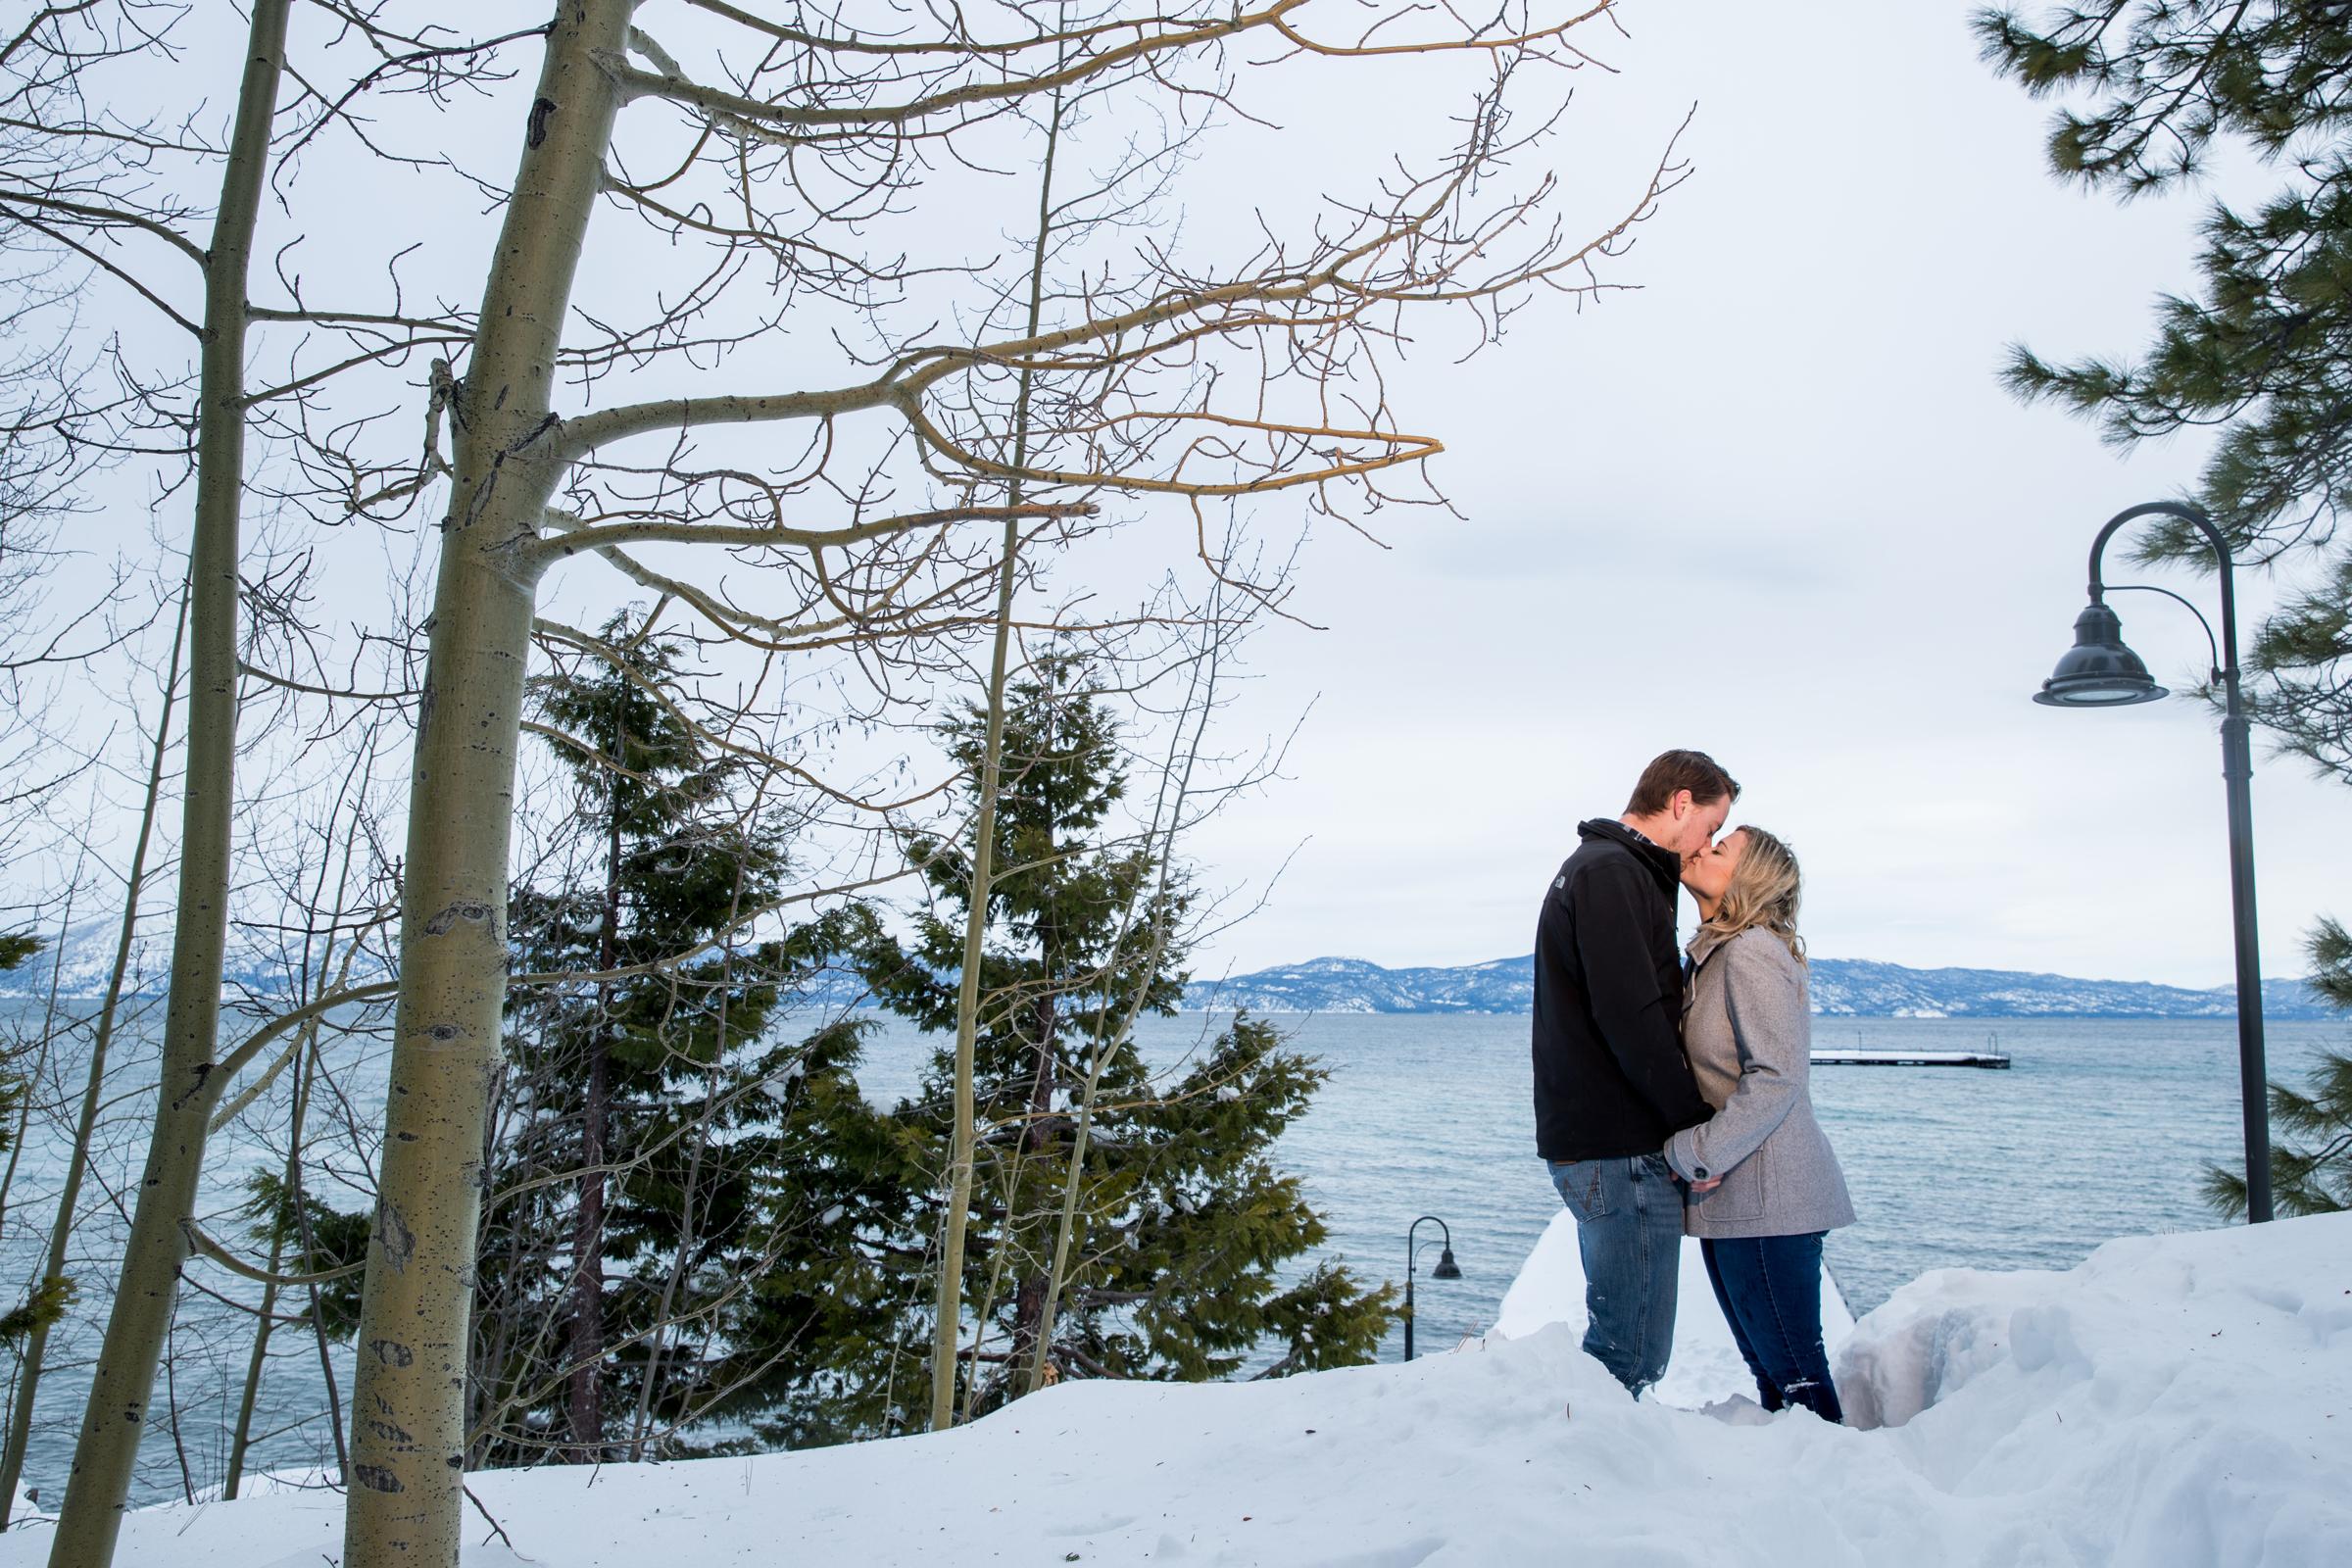 lake-tahoe-engagement-proposal-wedding-photographer-photography-gatekeepers-musuem-tahoe-city